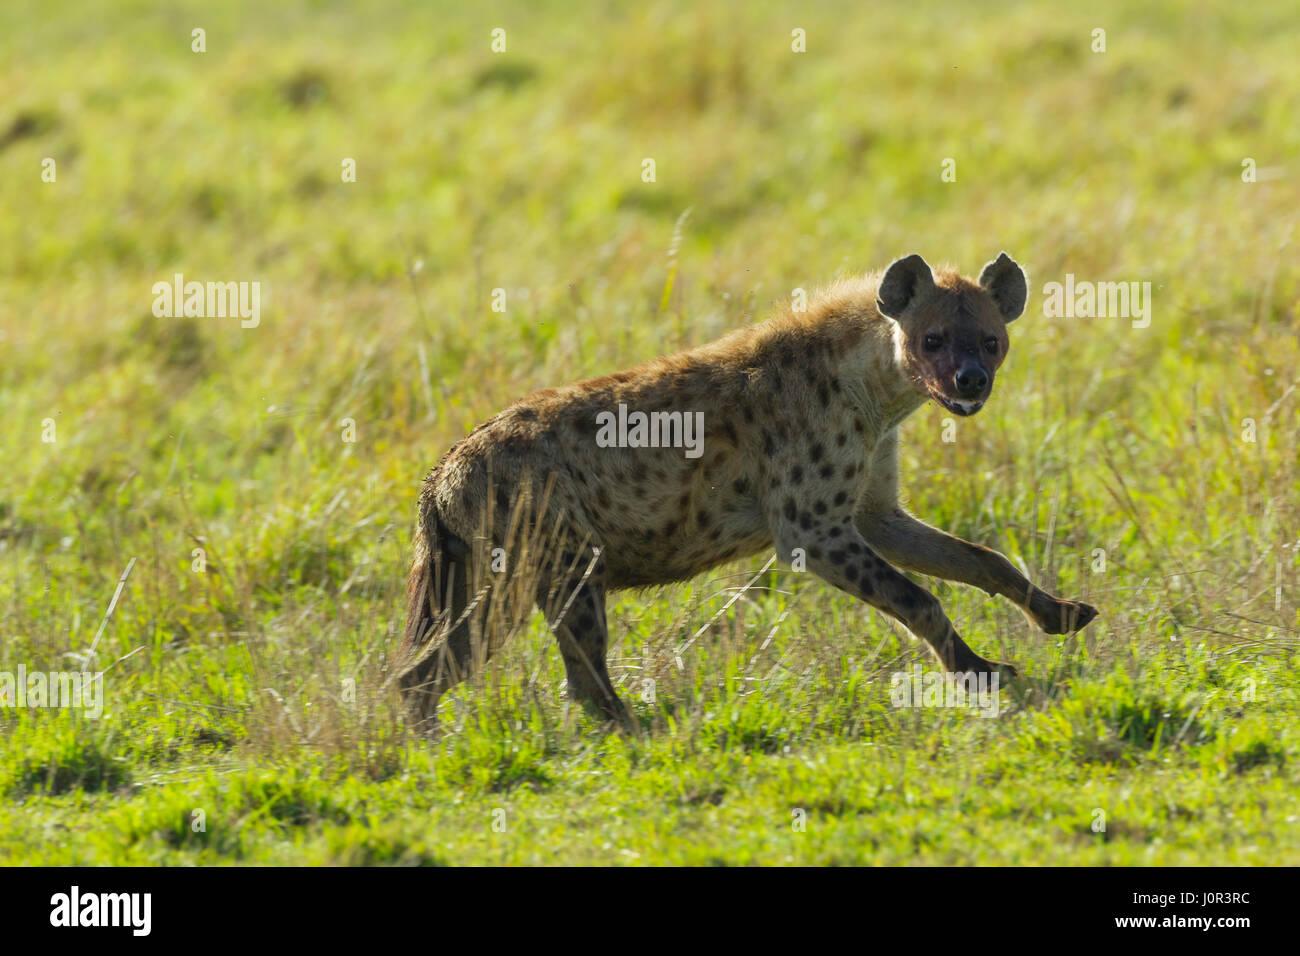 Spotted Hyena (Crocuta crocuta) running across the savannah, Masai Mara National Reserve, Kenya - Stock Image